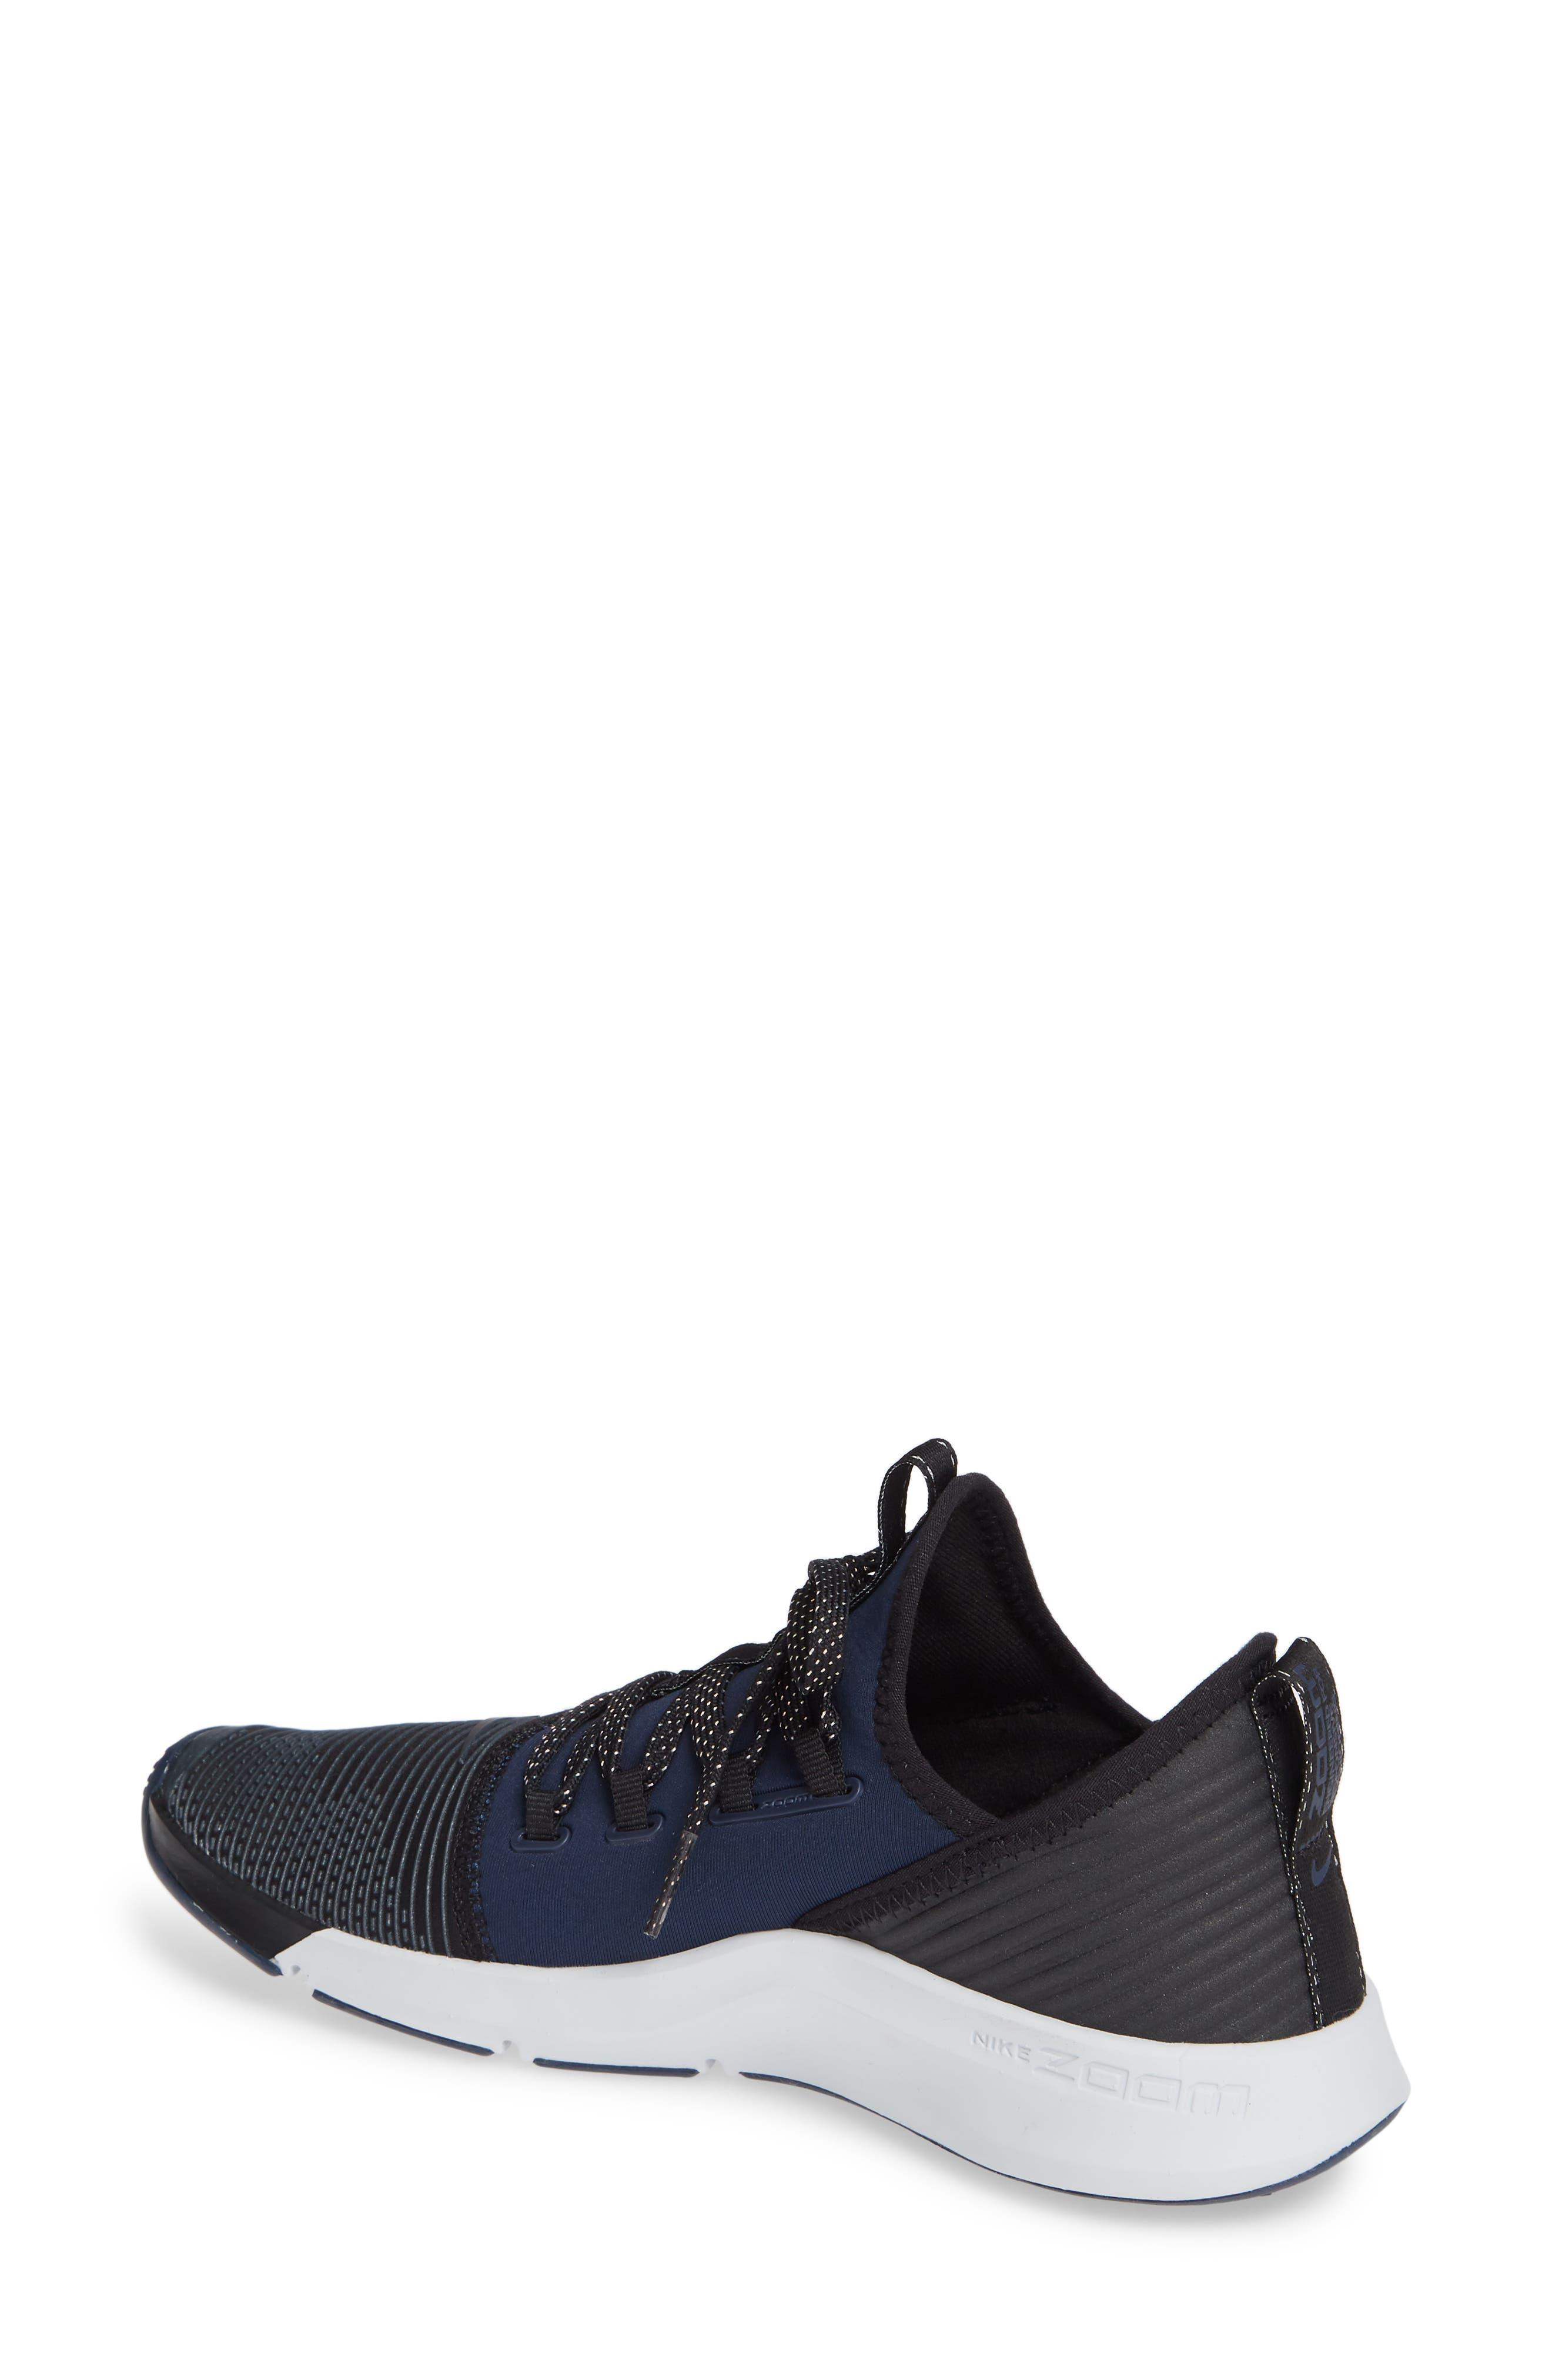 NIKE,                             Air Zoom Elevate Training Shoe,                             Alternate thumbnail 2, color,                             BLACK/ METALLIC NAVY- NAVY